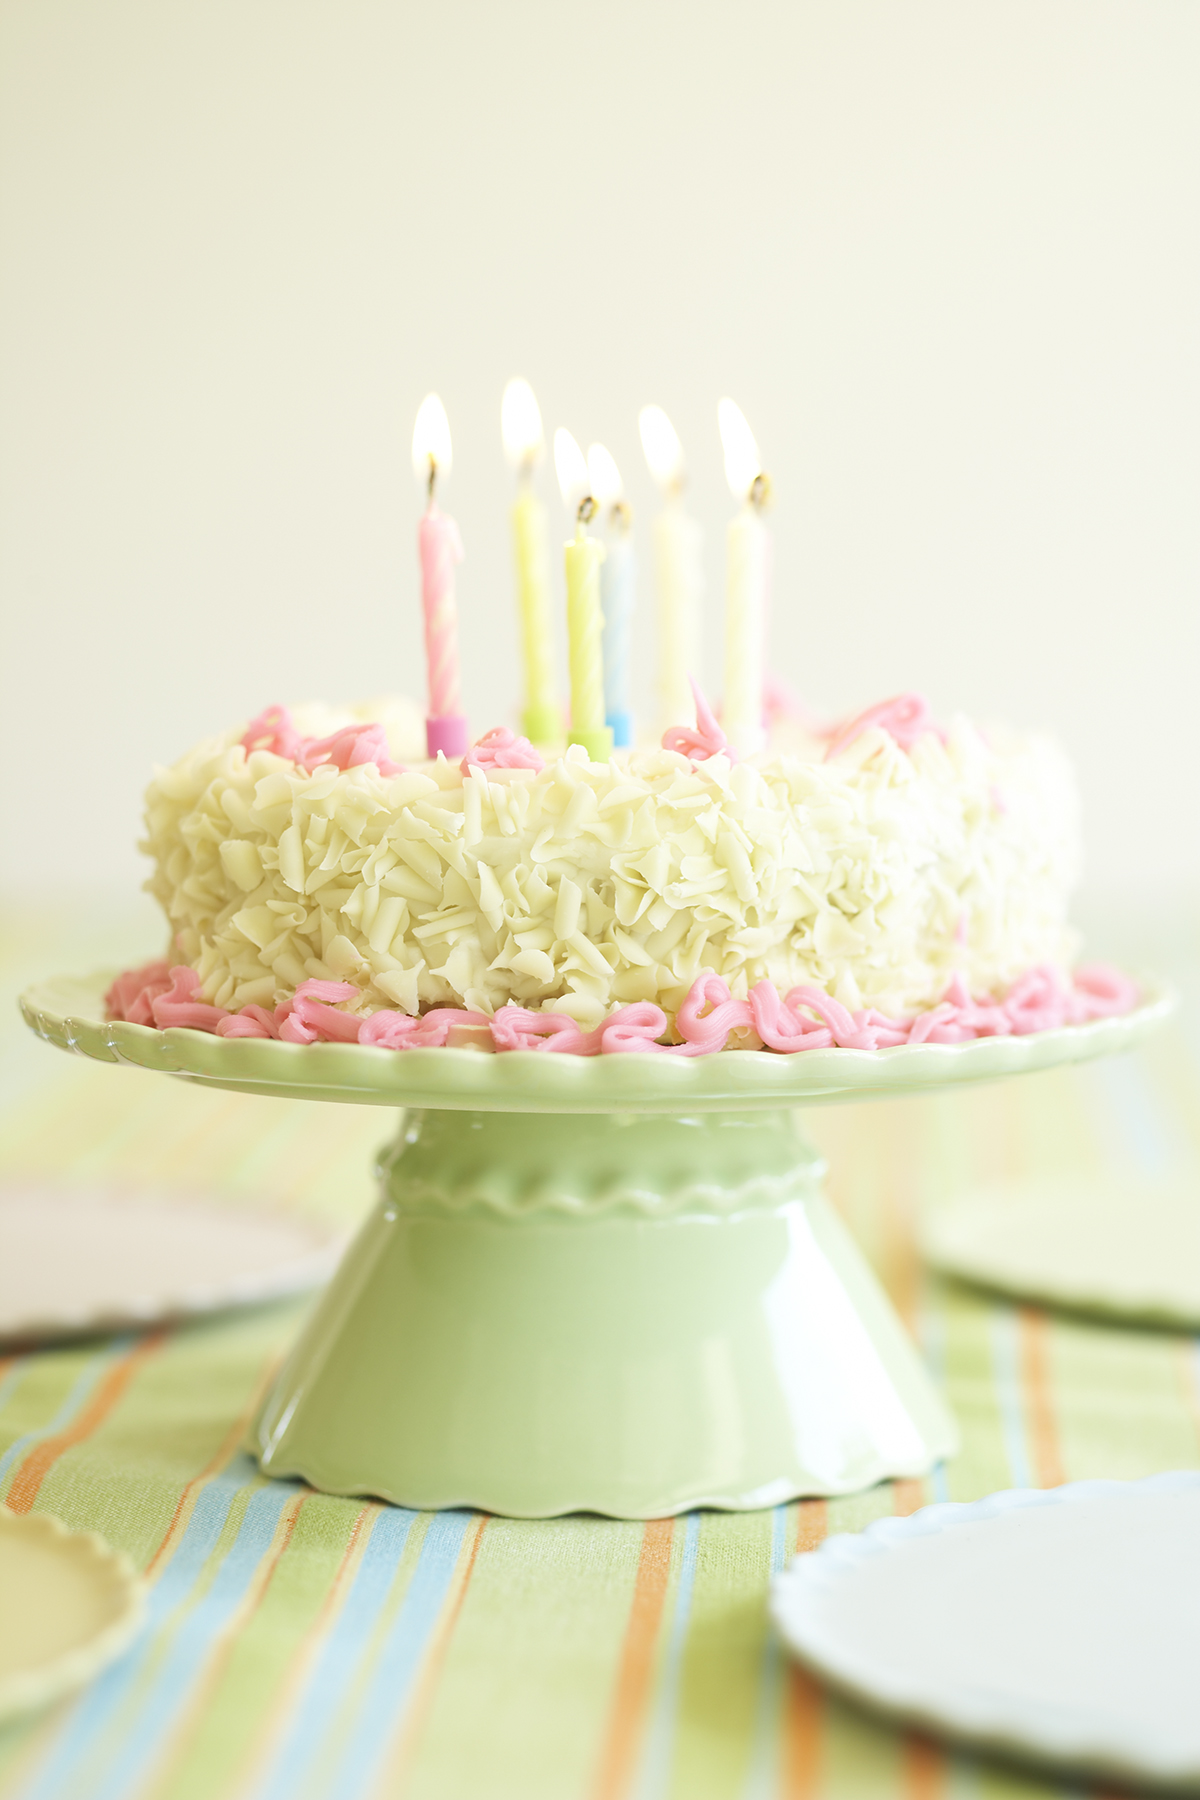 Cake-007.jpg